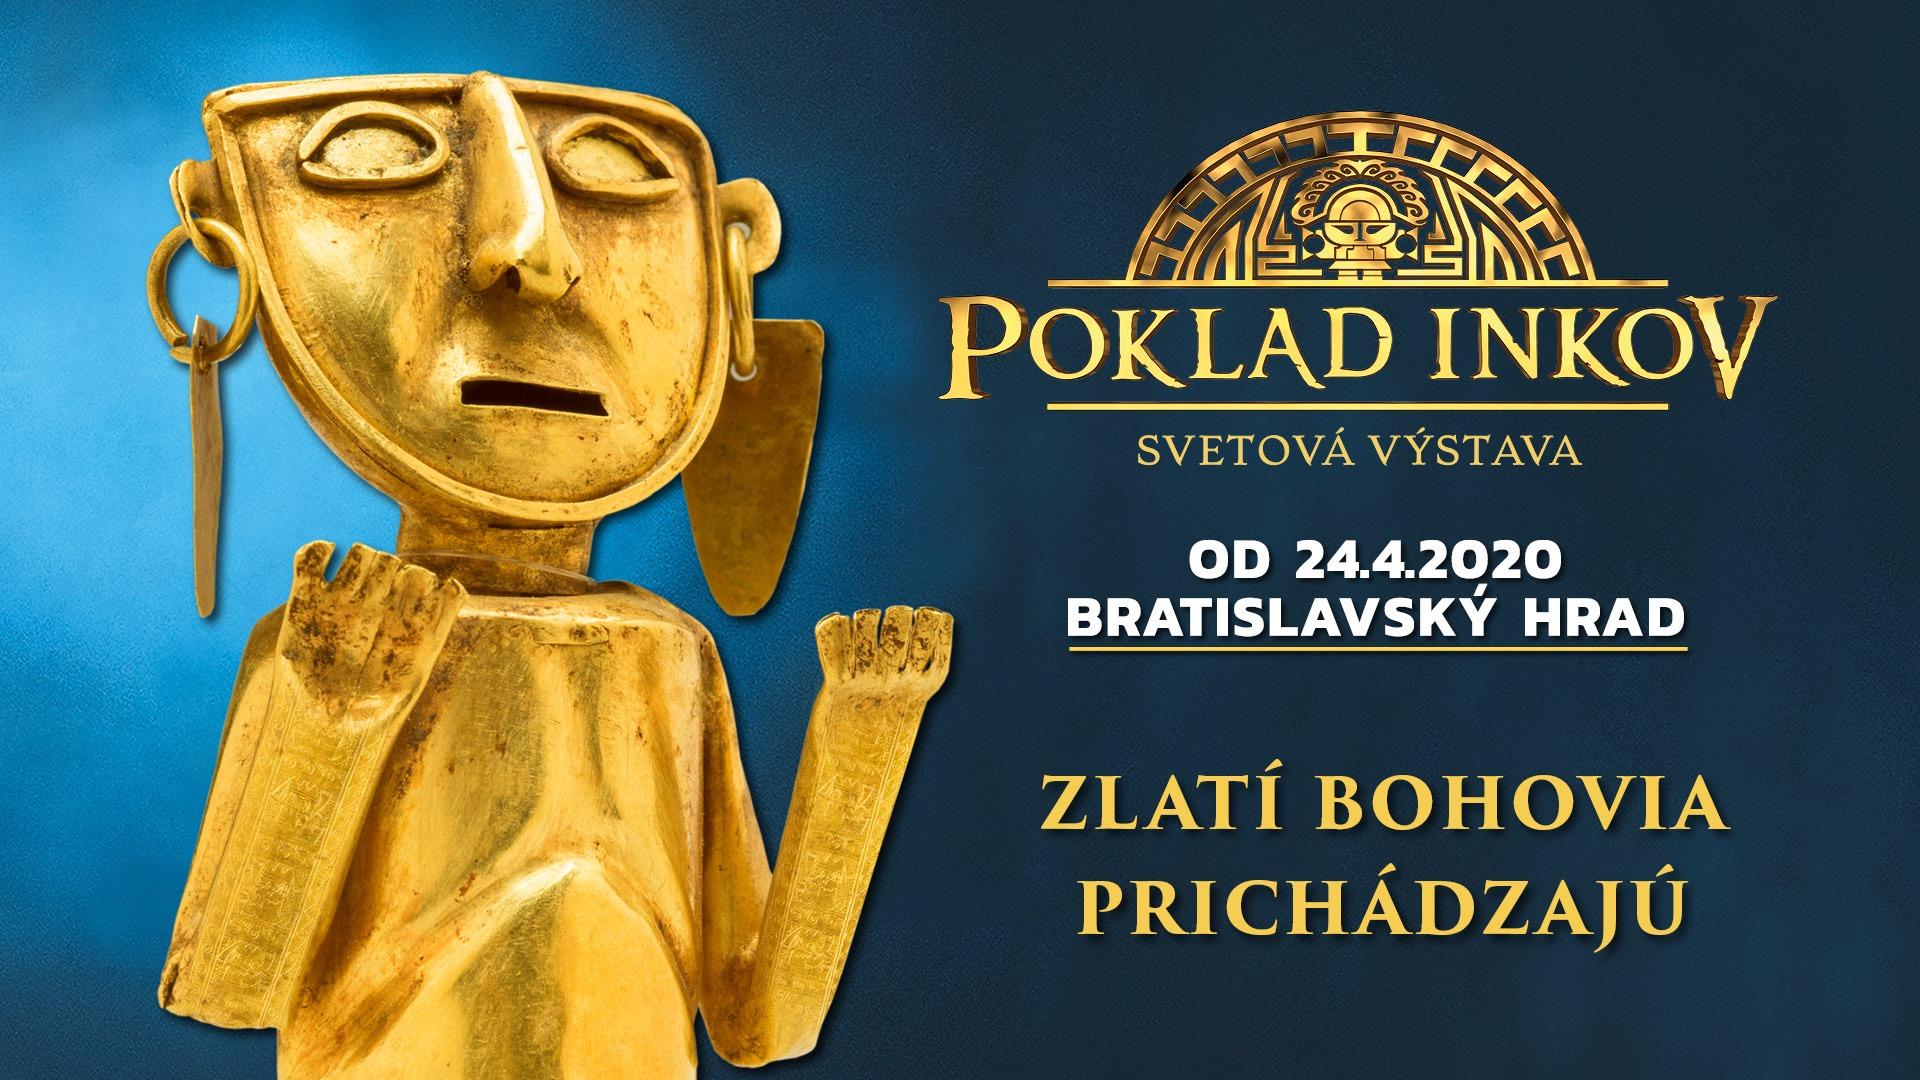 Výstava Poklad Inkov Bratislava od 24.6.